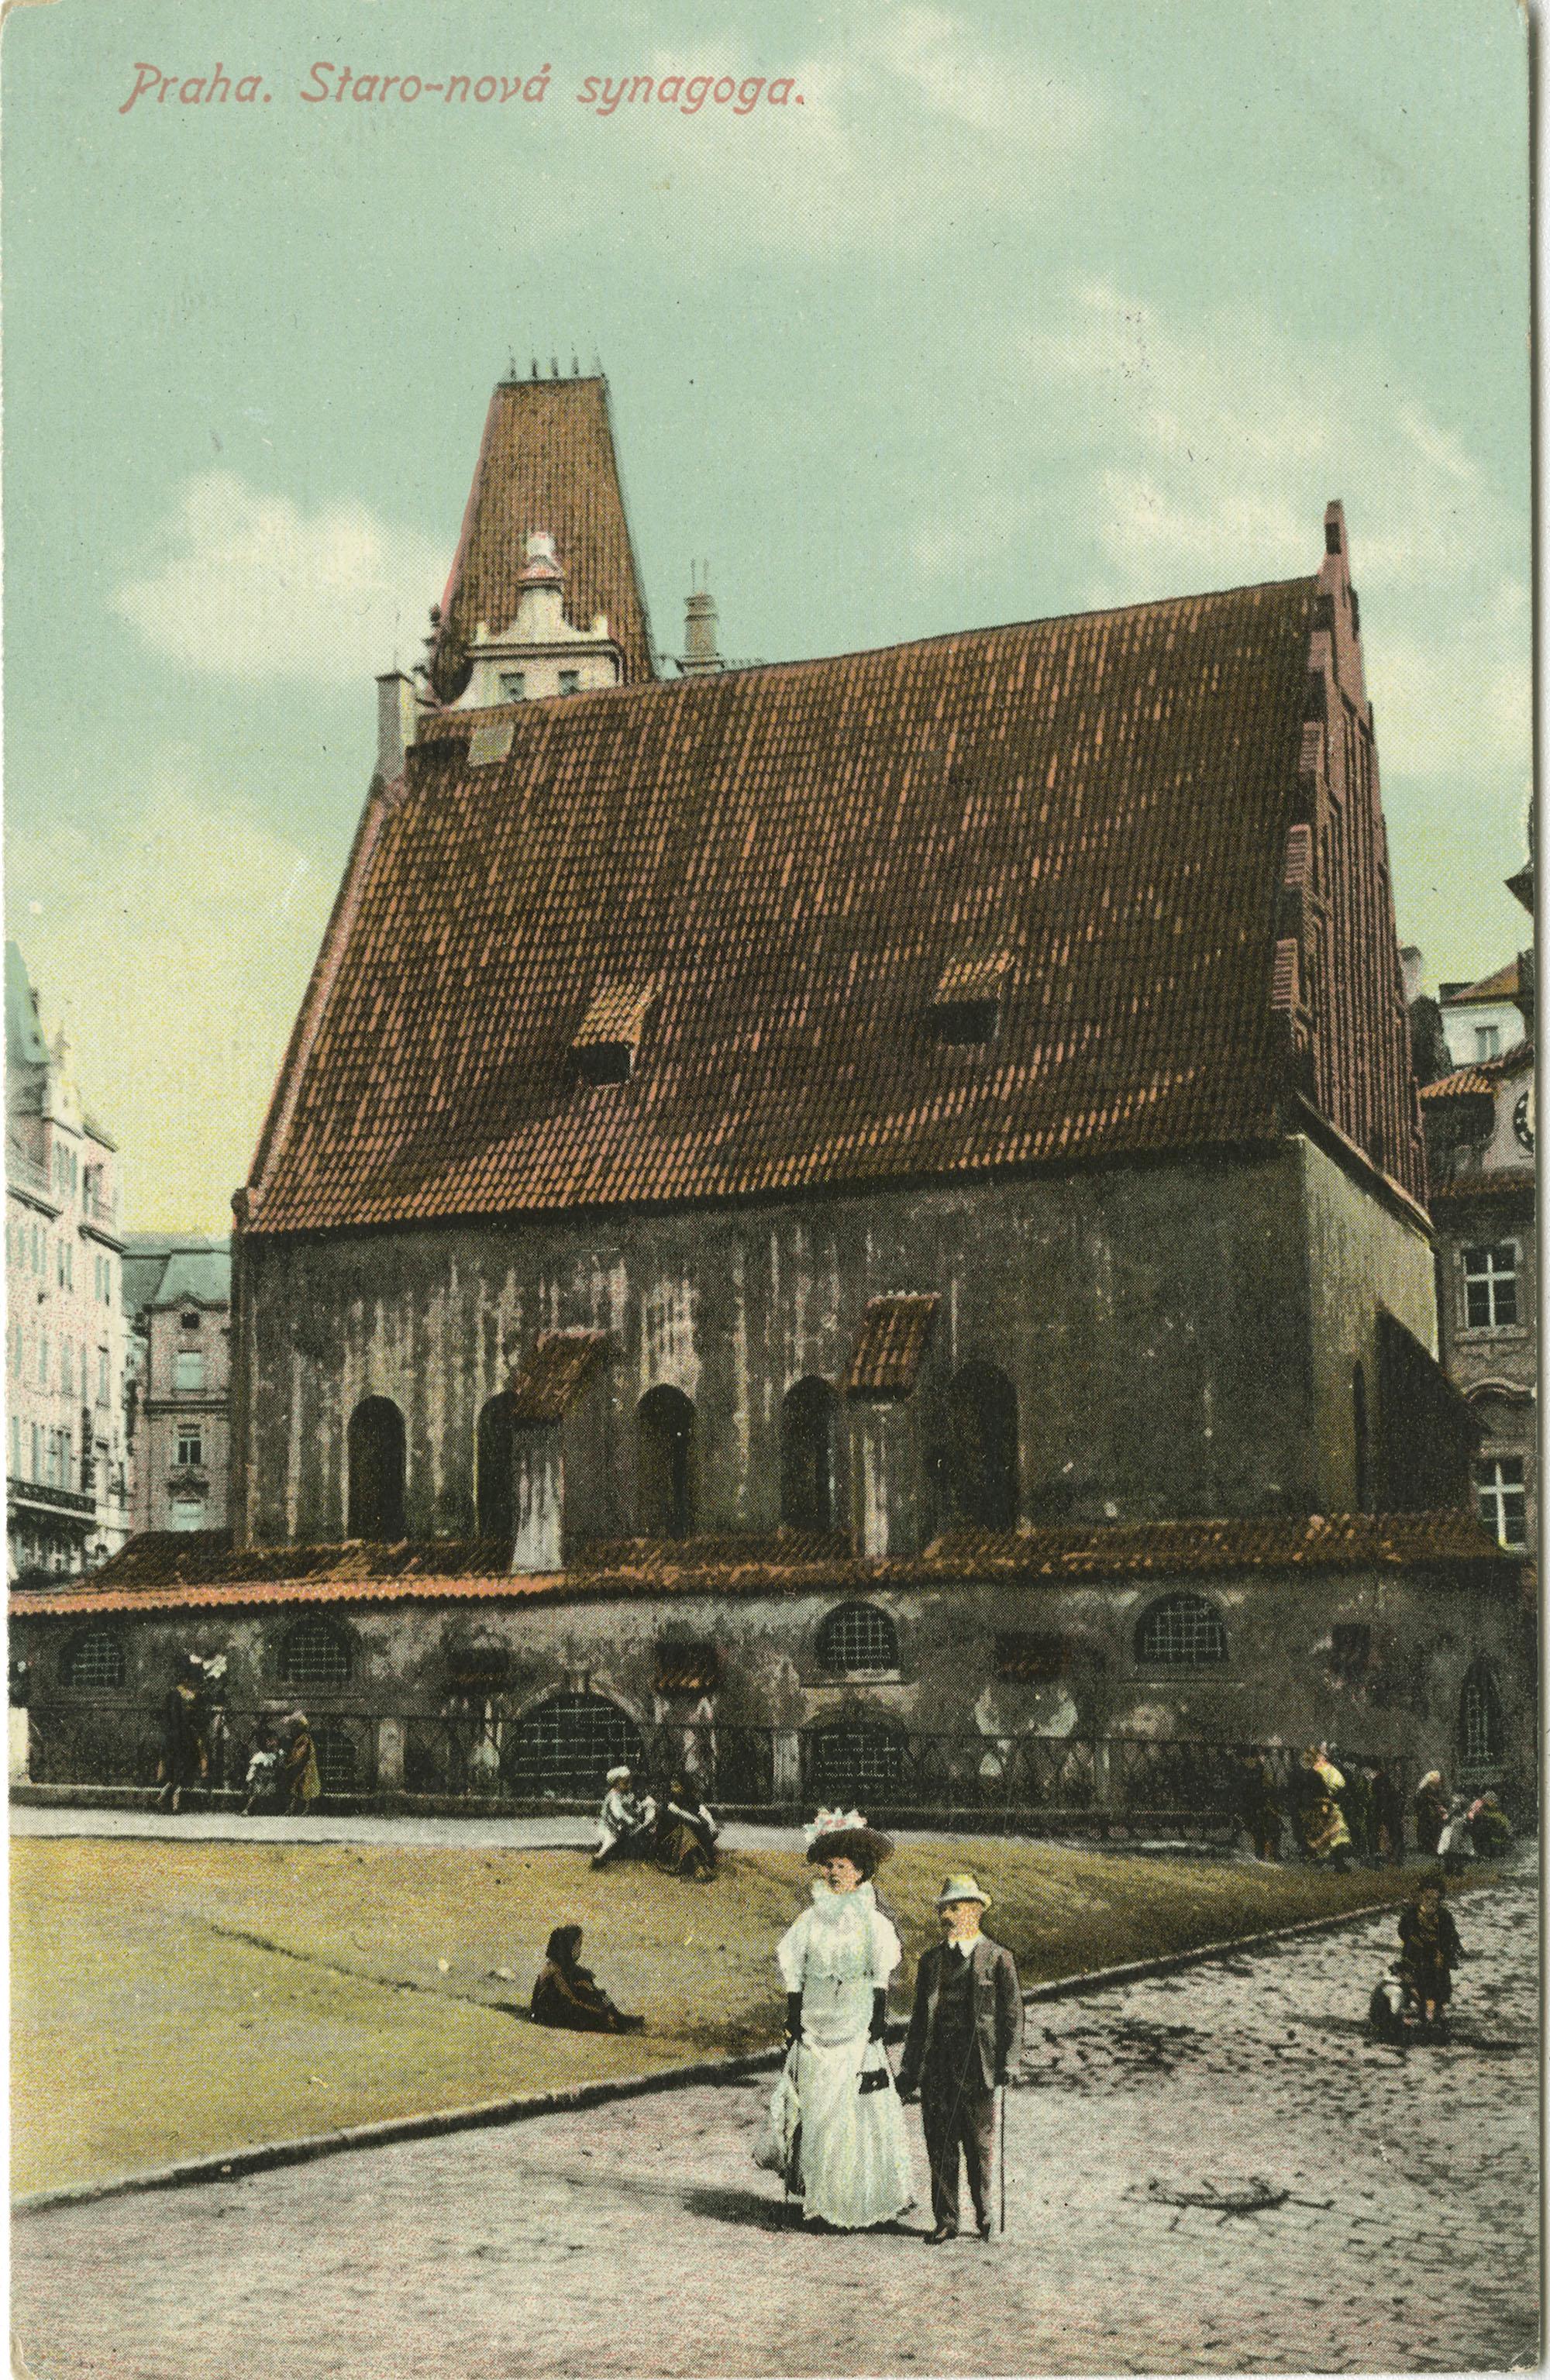 Praha. Staro-nová synagoga.